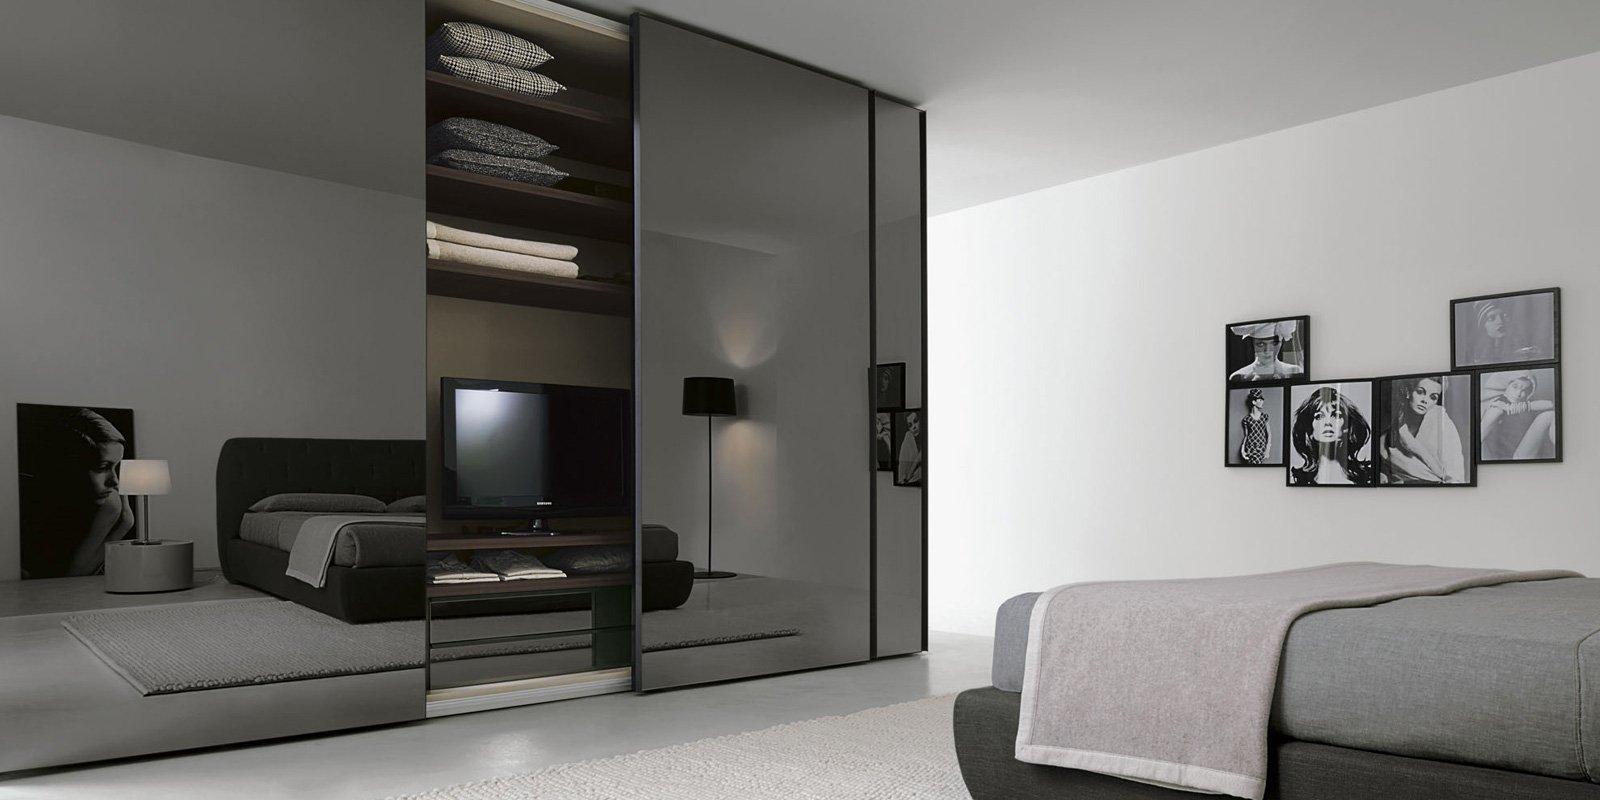 Contemporary bedroom furniture in southern ca - Armadi Wardrobe System 1 San Francisco Ca